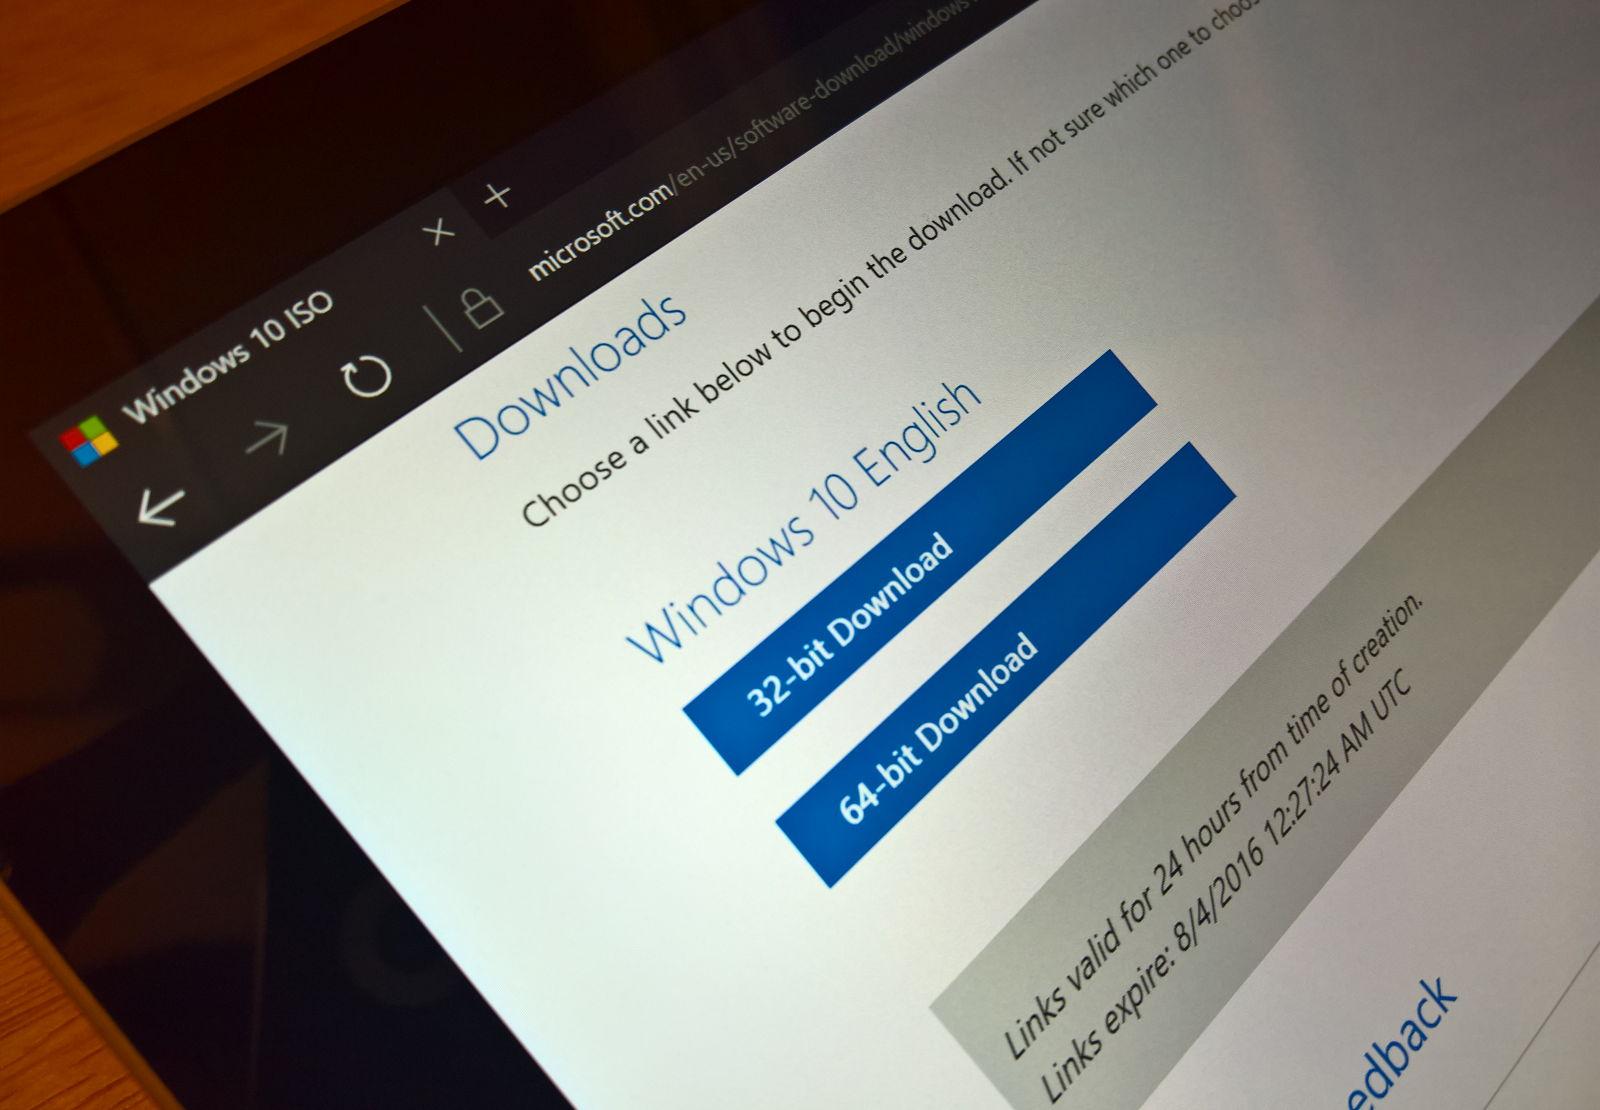 download windows 10 64 bit update